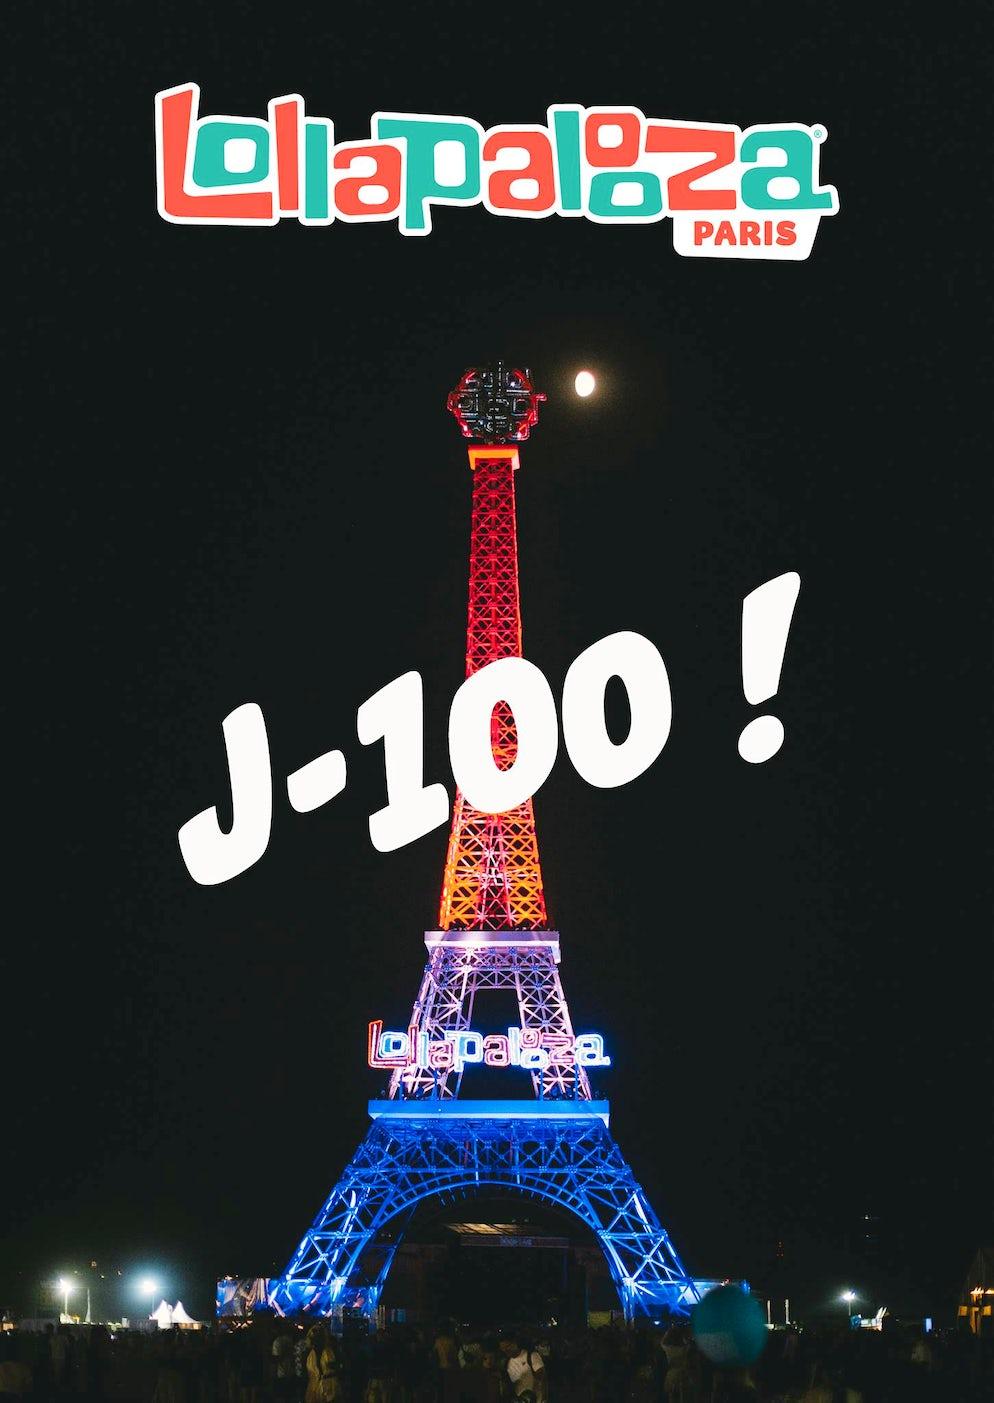 Photo Credit © Facebook/Lollapalooza Paris